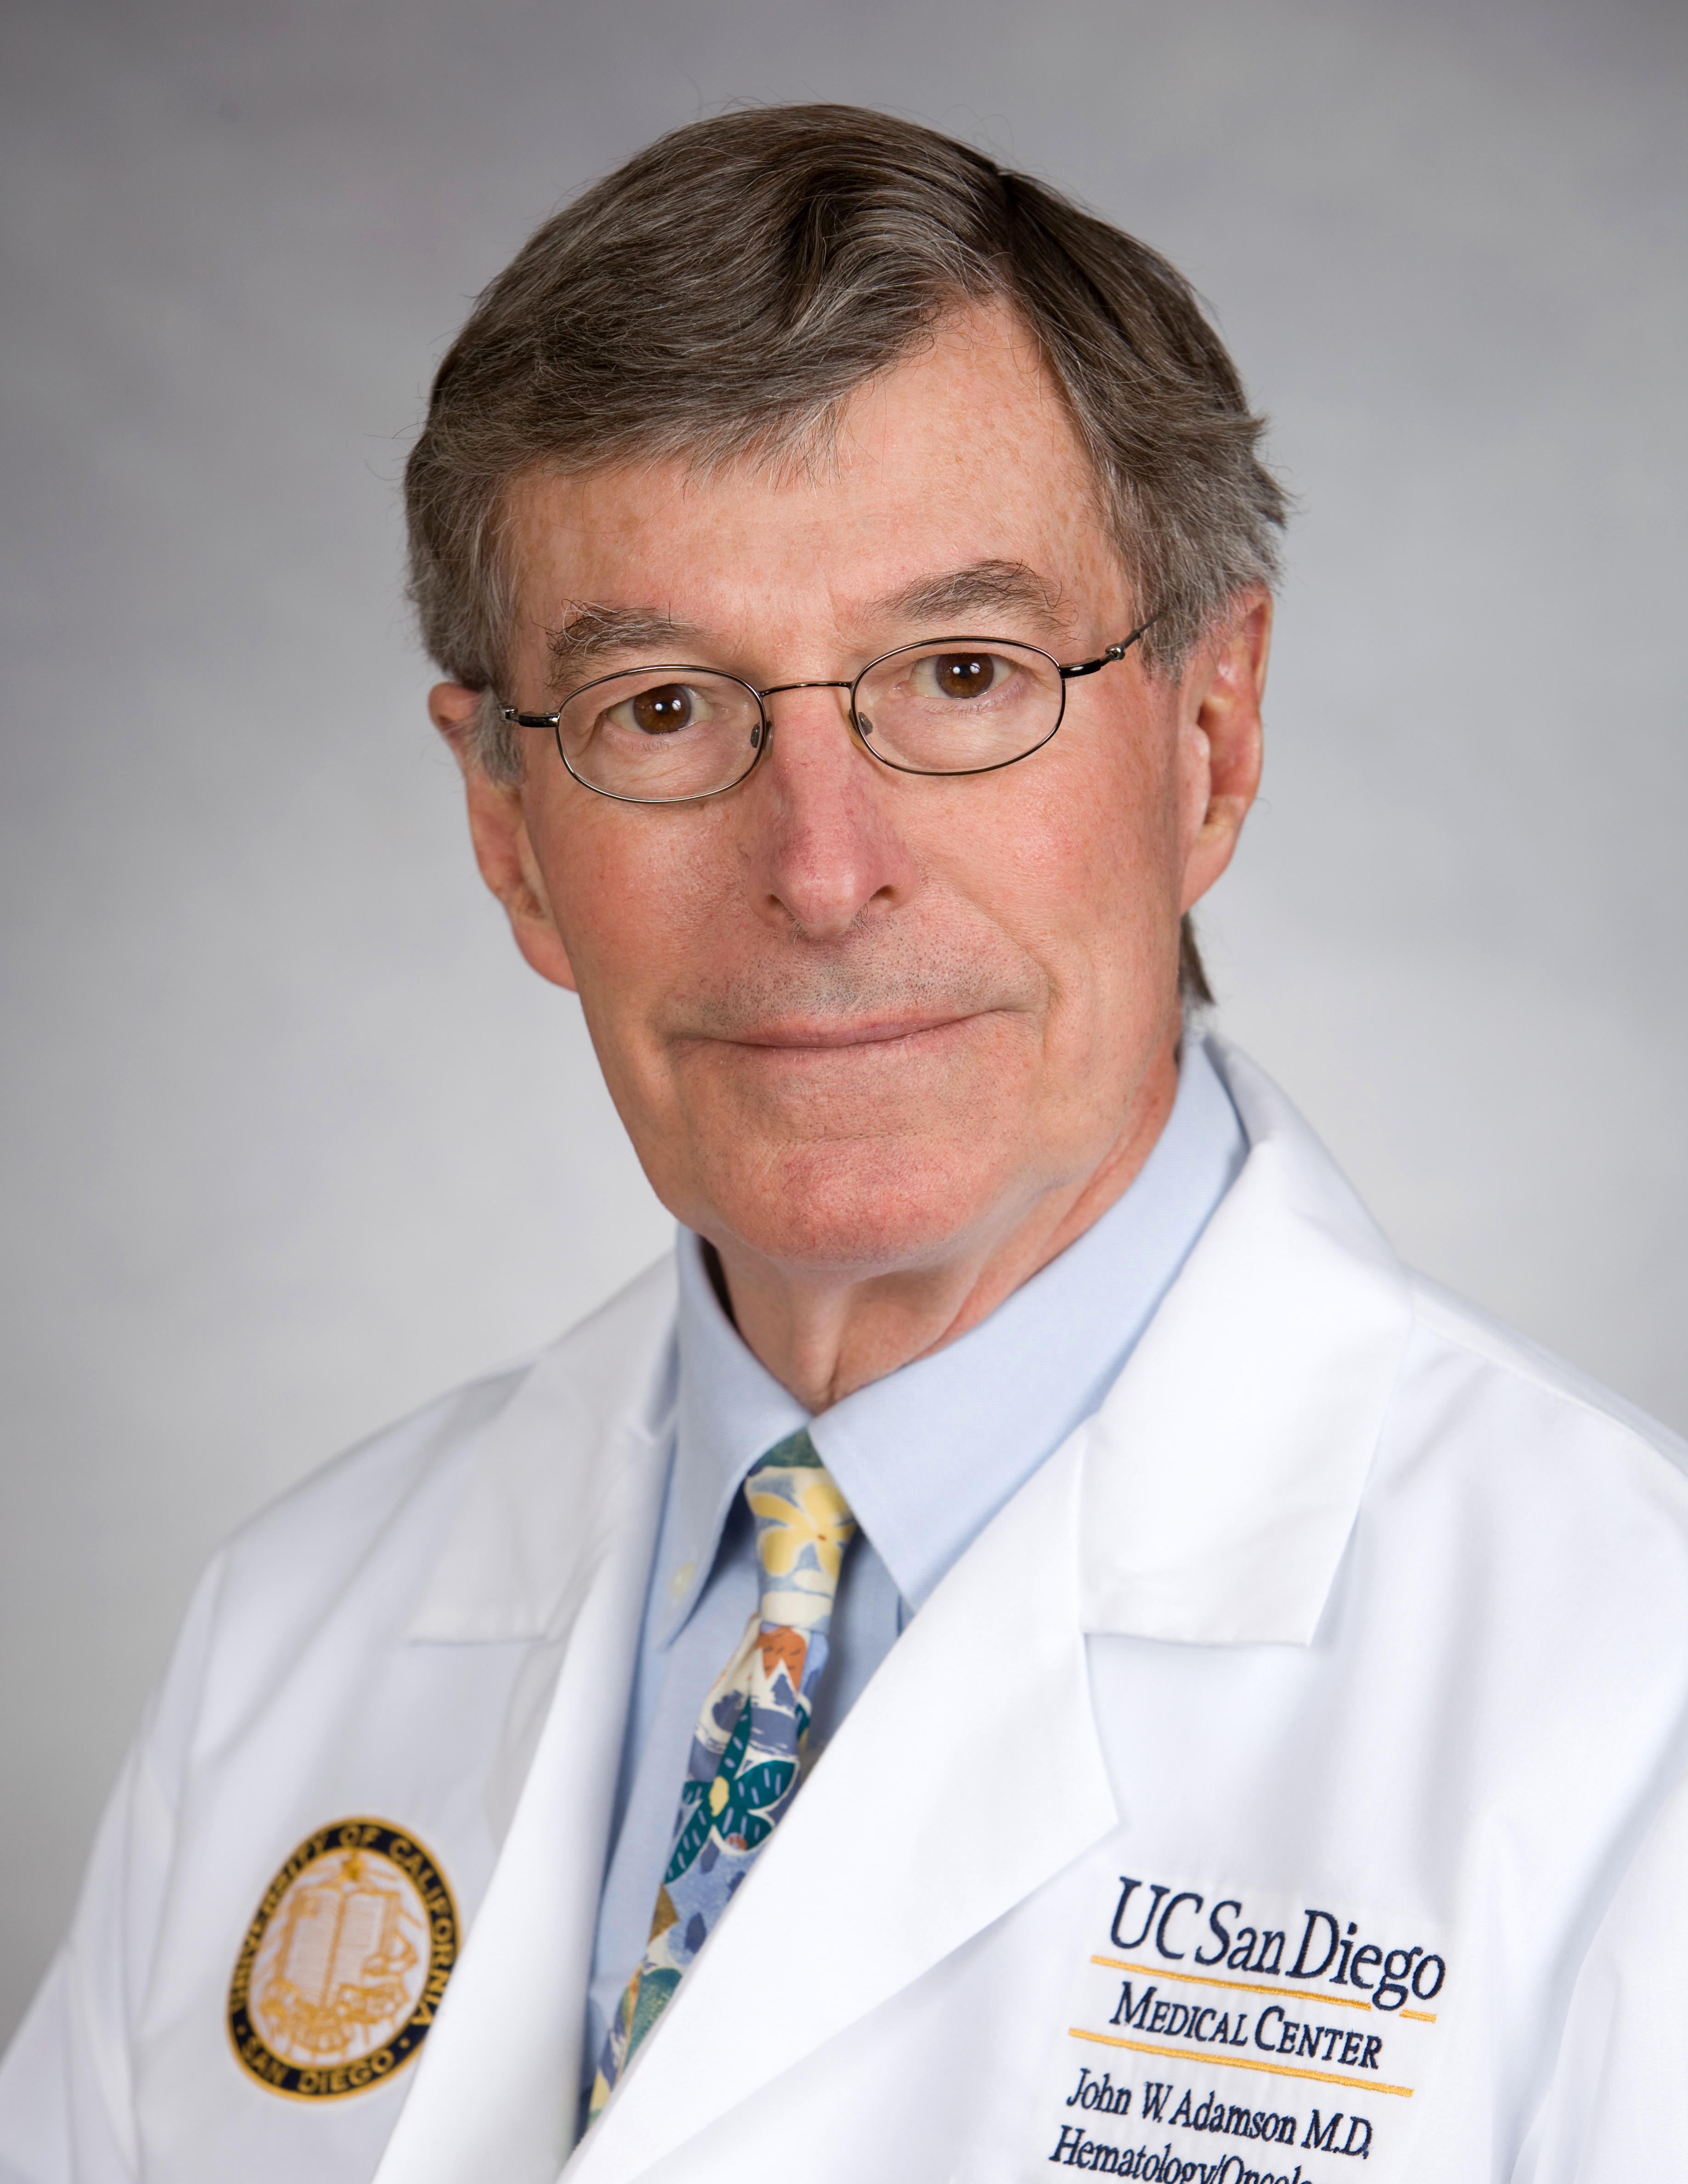 Image For Dr. John W Adamson MD